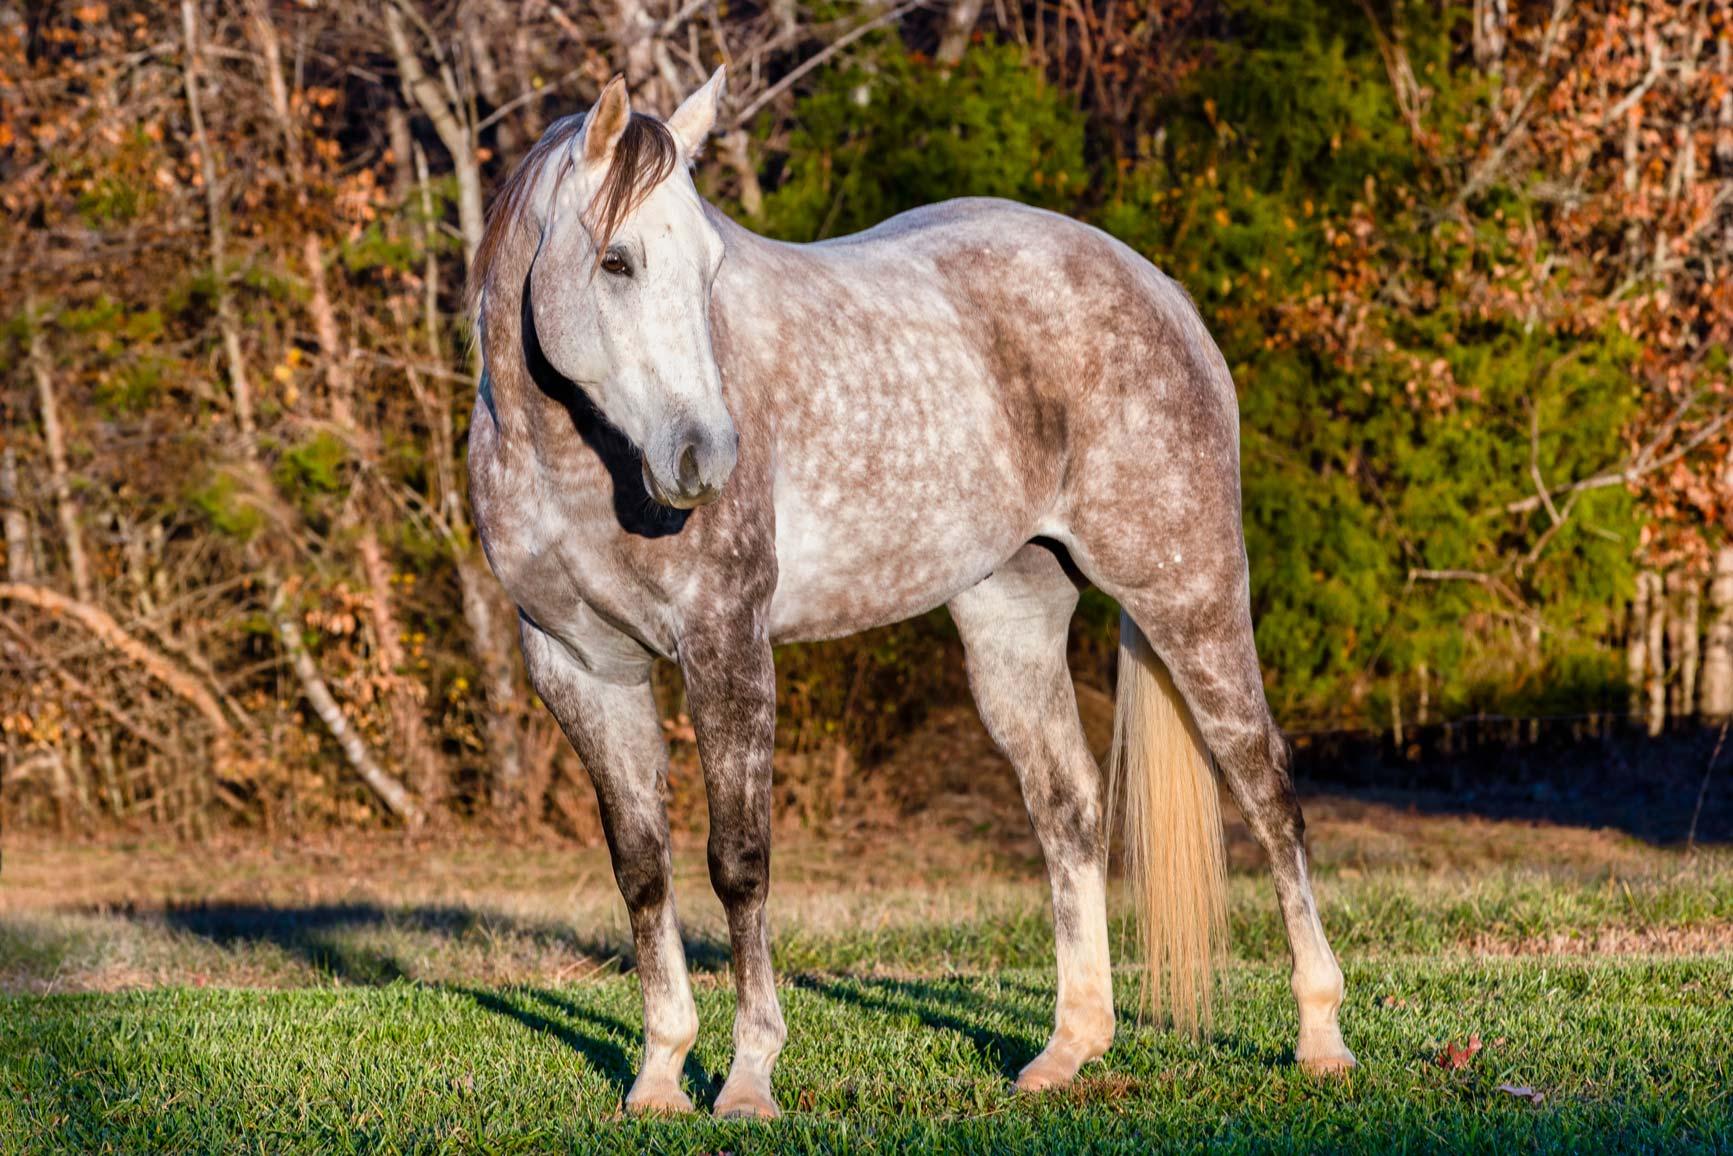 Rawhide-Ranch-Traveler_59I6986